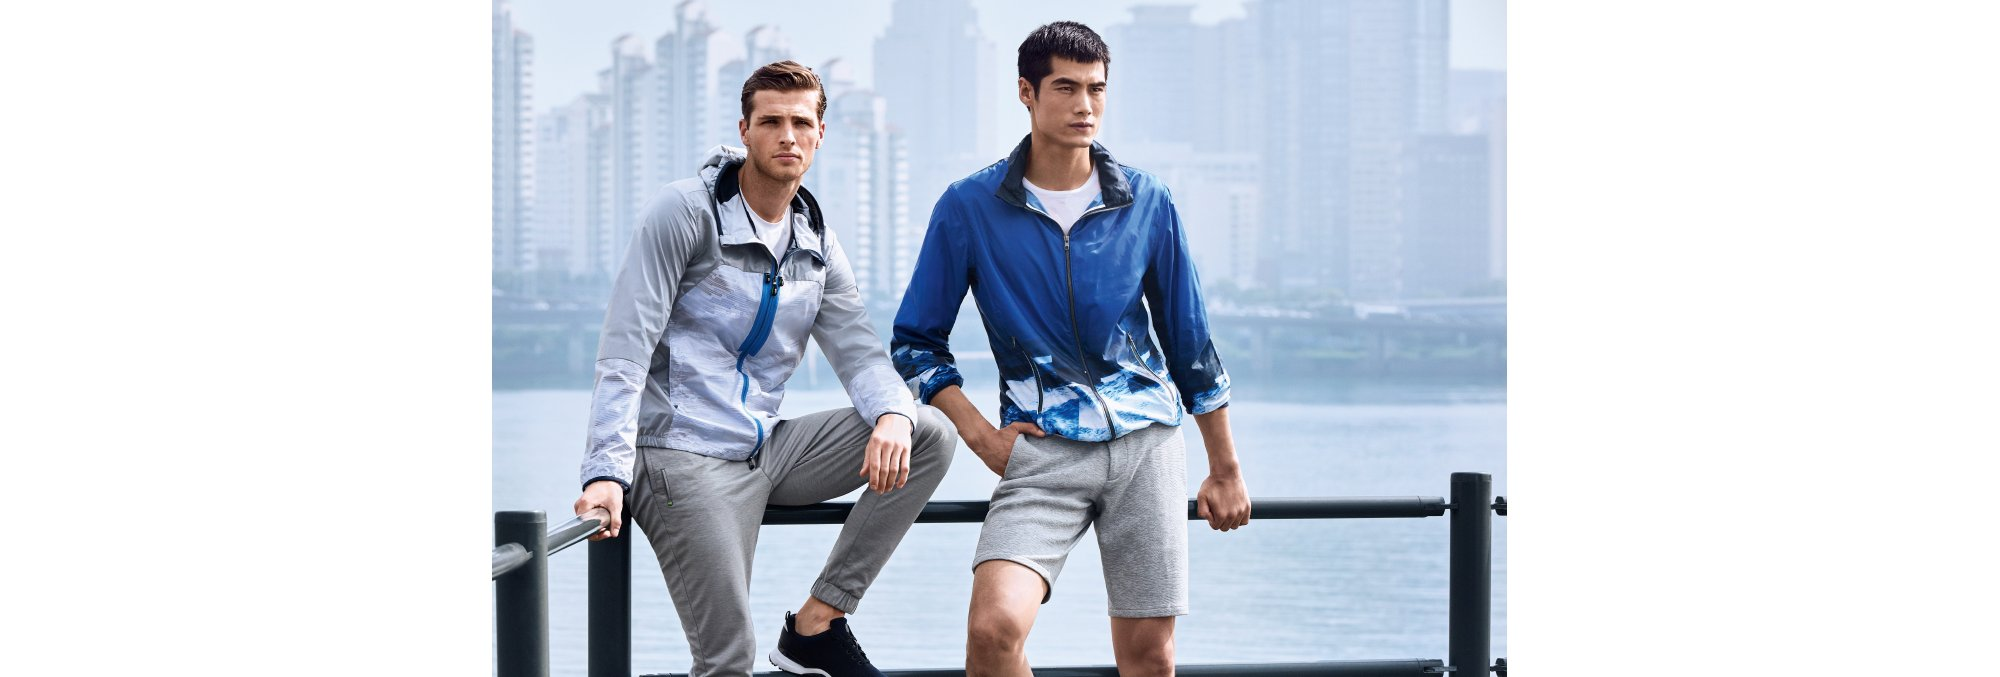 Grey jacket and blue Jocean jacket by BOSS Green